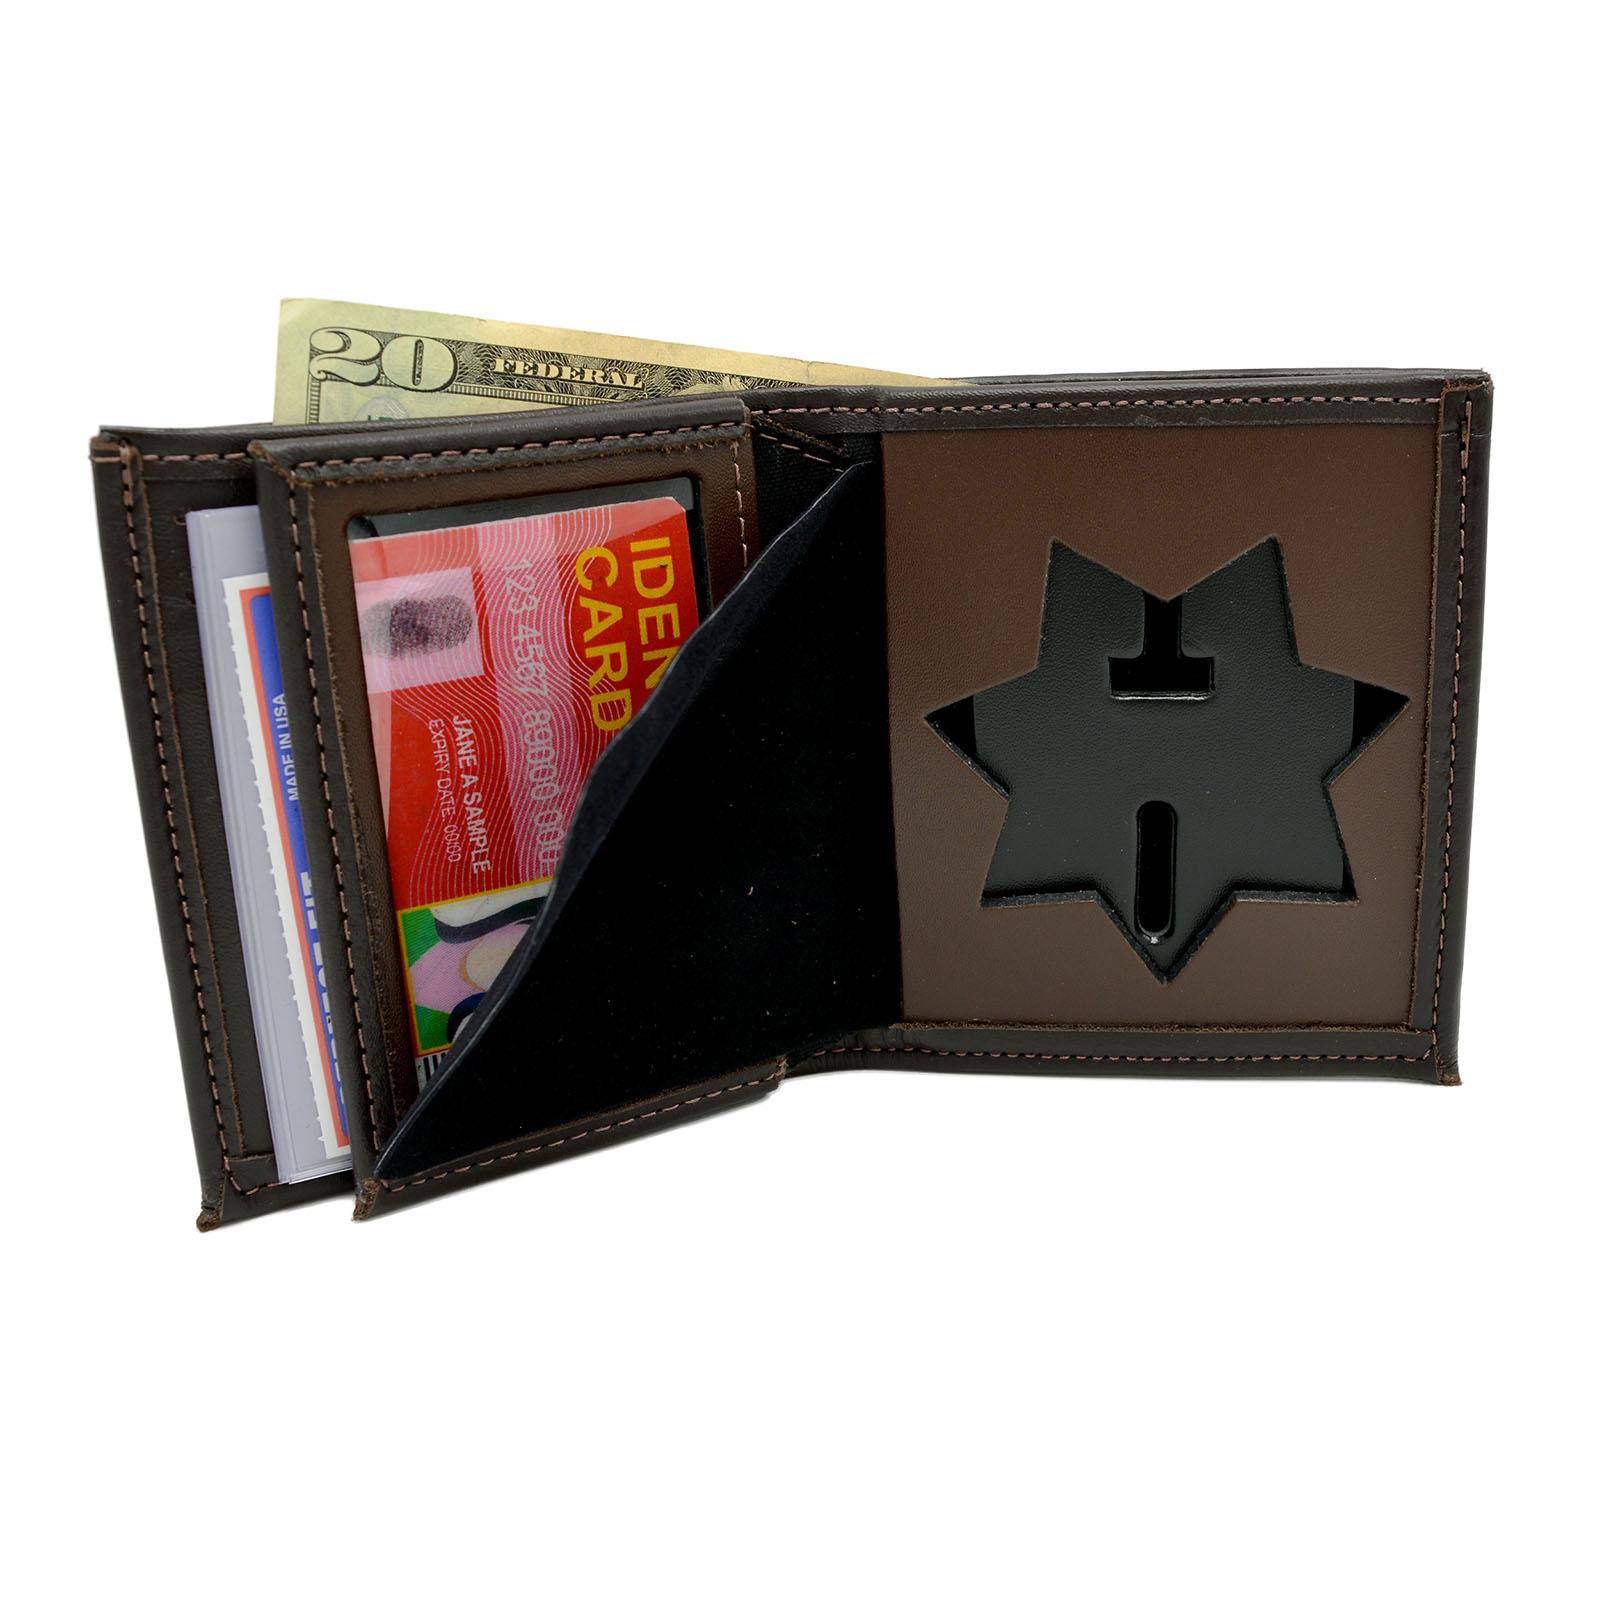 cdcr-california-corrections-7-point-star-badge-wallet-brown-1.jpg